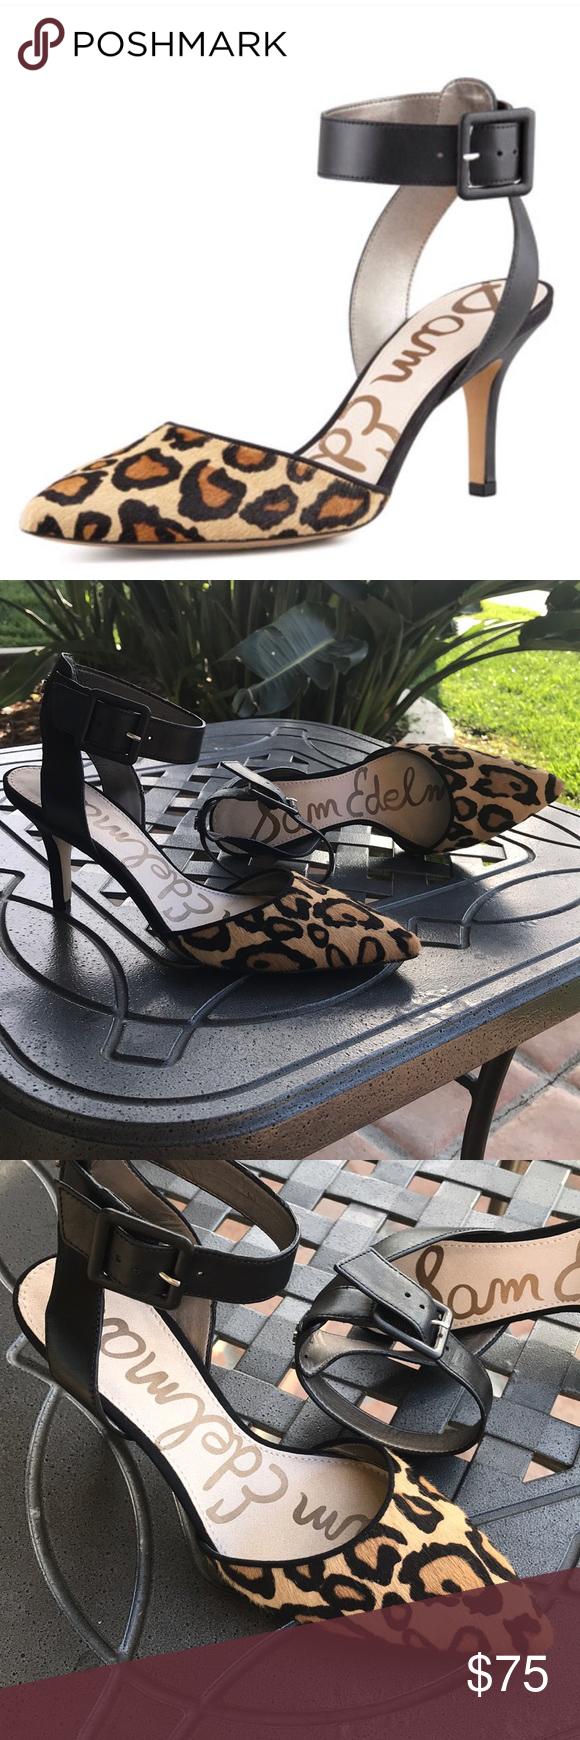 832eedfcf732 Sam Edelman Okala leopard cow fur Sam Edelman dyed calf hair (China) and  leather d Orsay pump. 2.8